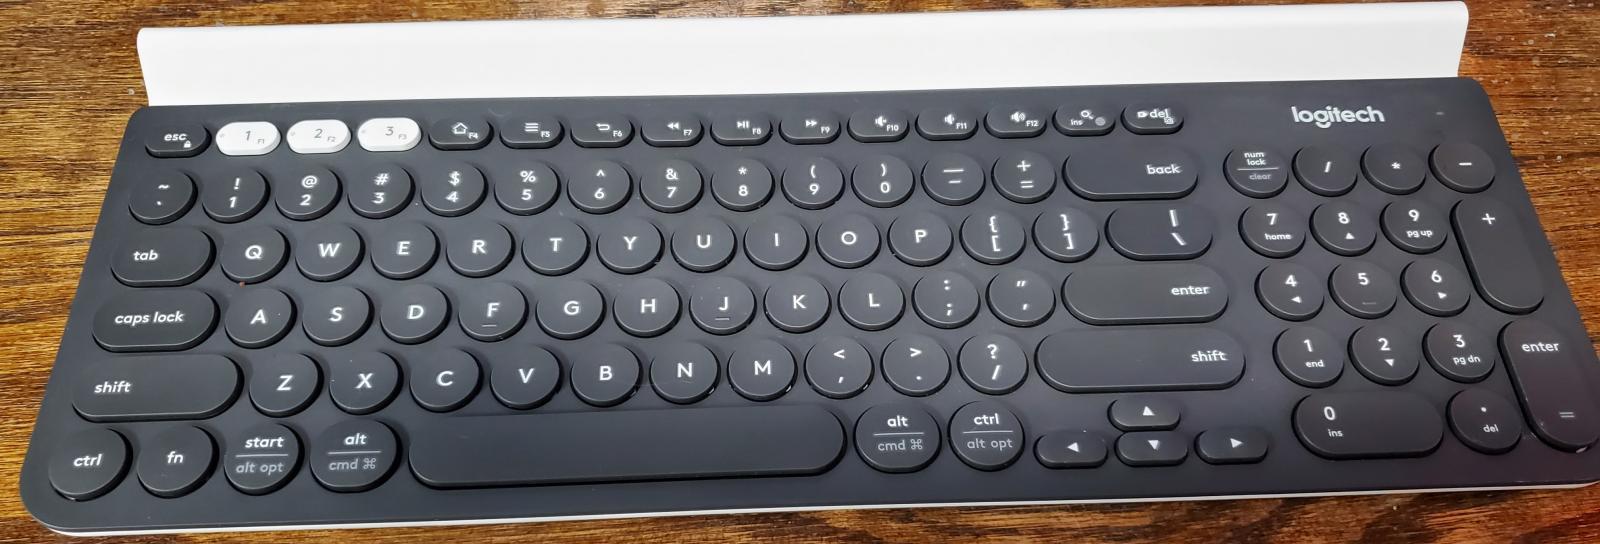 Photo of Logitech K780 Multi-device Bluetooth/2.4ghz wireless Keyboard